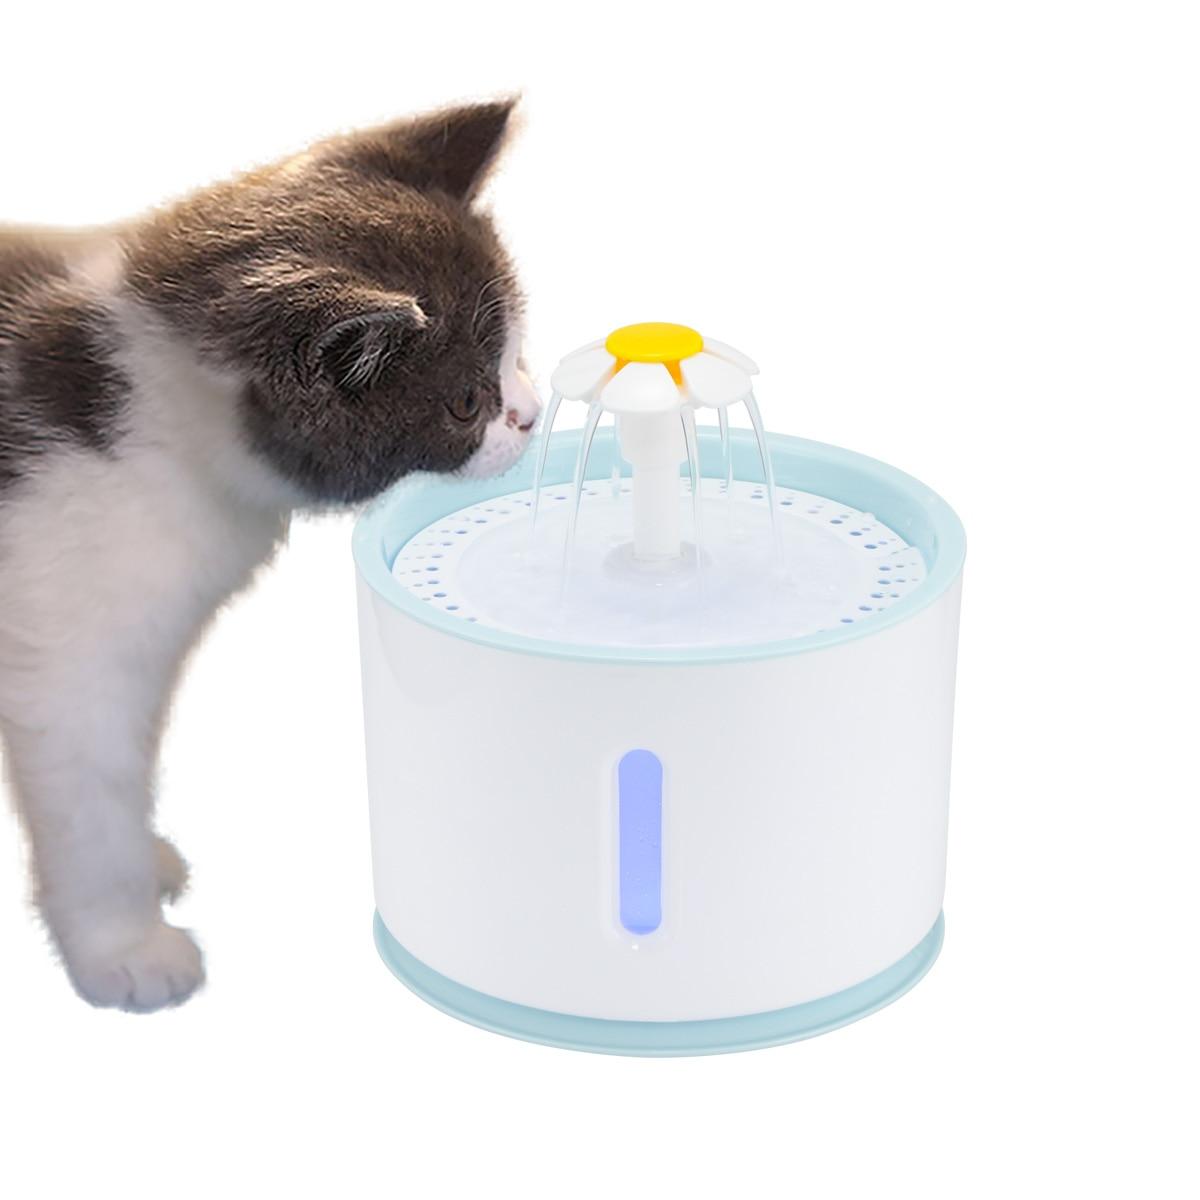 2.4L automática gato fuente de agua con eléctrica LED USB perro gato mascotas mudo alimentador de bebedero de tazón de fuente de beber para mascotas dispensador